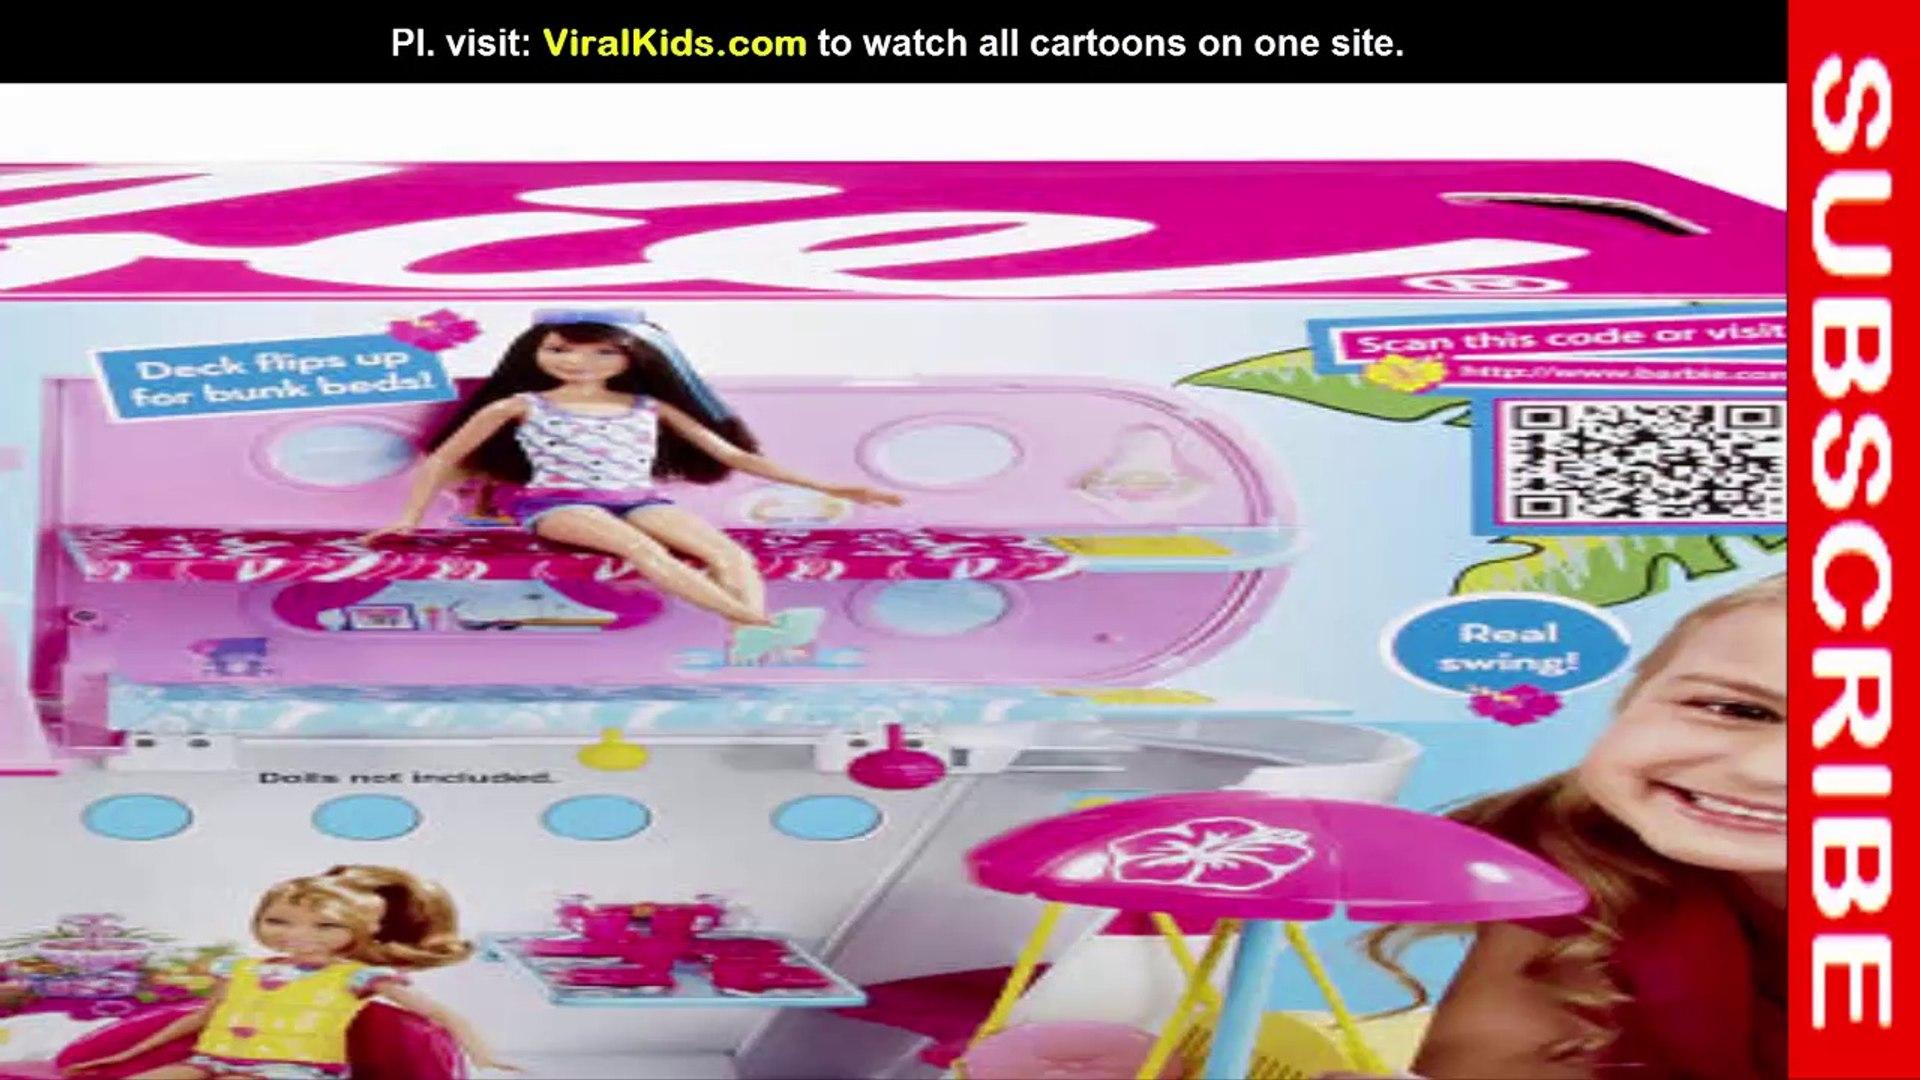 Barbie Sisters Cruise Ship - Navire de croisière Barbie Sisters - Barbie Sisters crucero